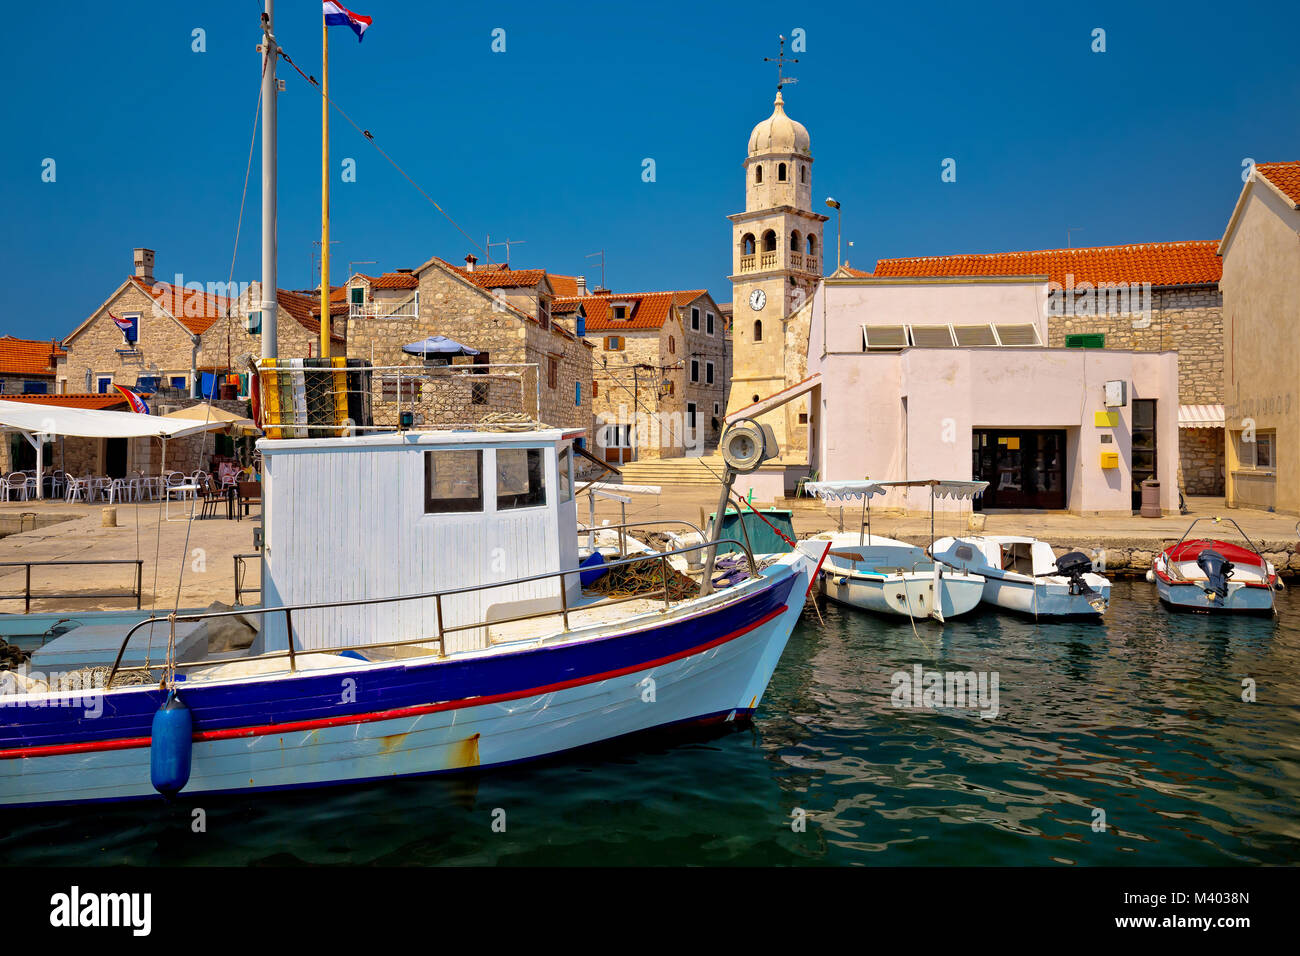 Island of Prvic harbor and waterfront view in Sepurine village, Sibenik archipelago of Croatia - Stock Image